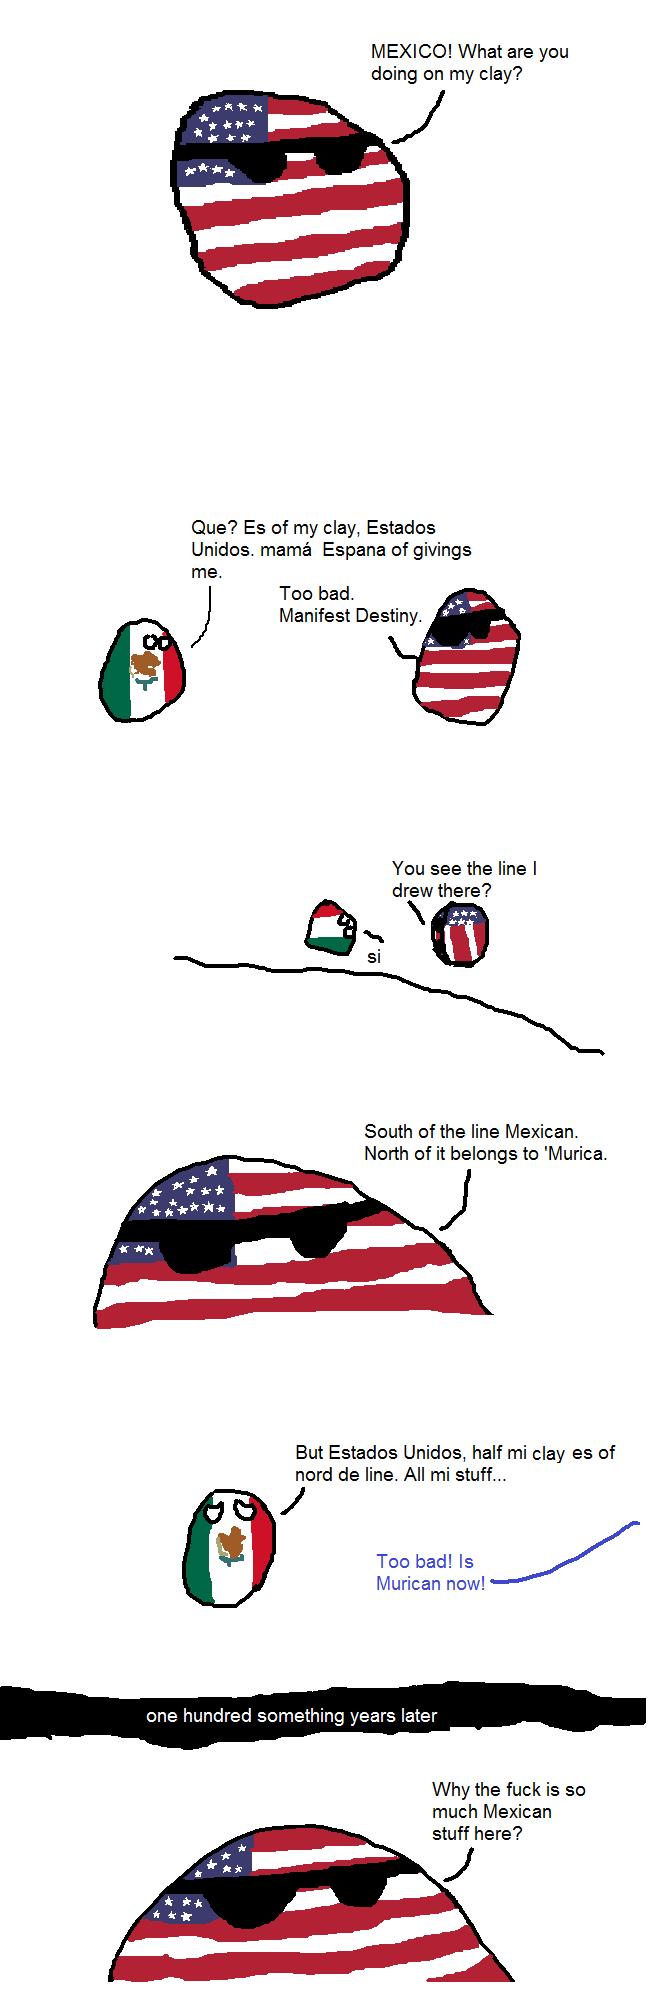 Tierra Muricana